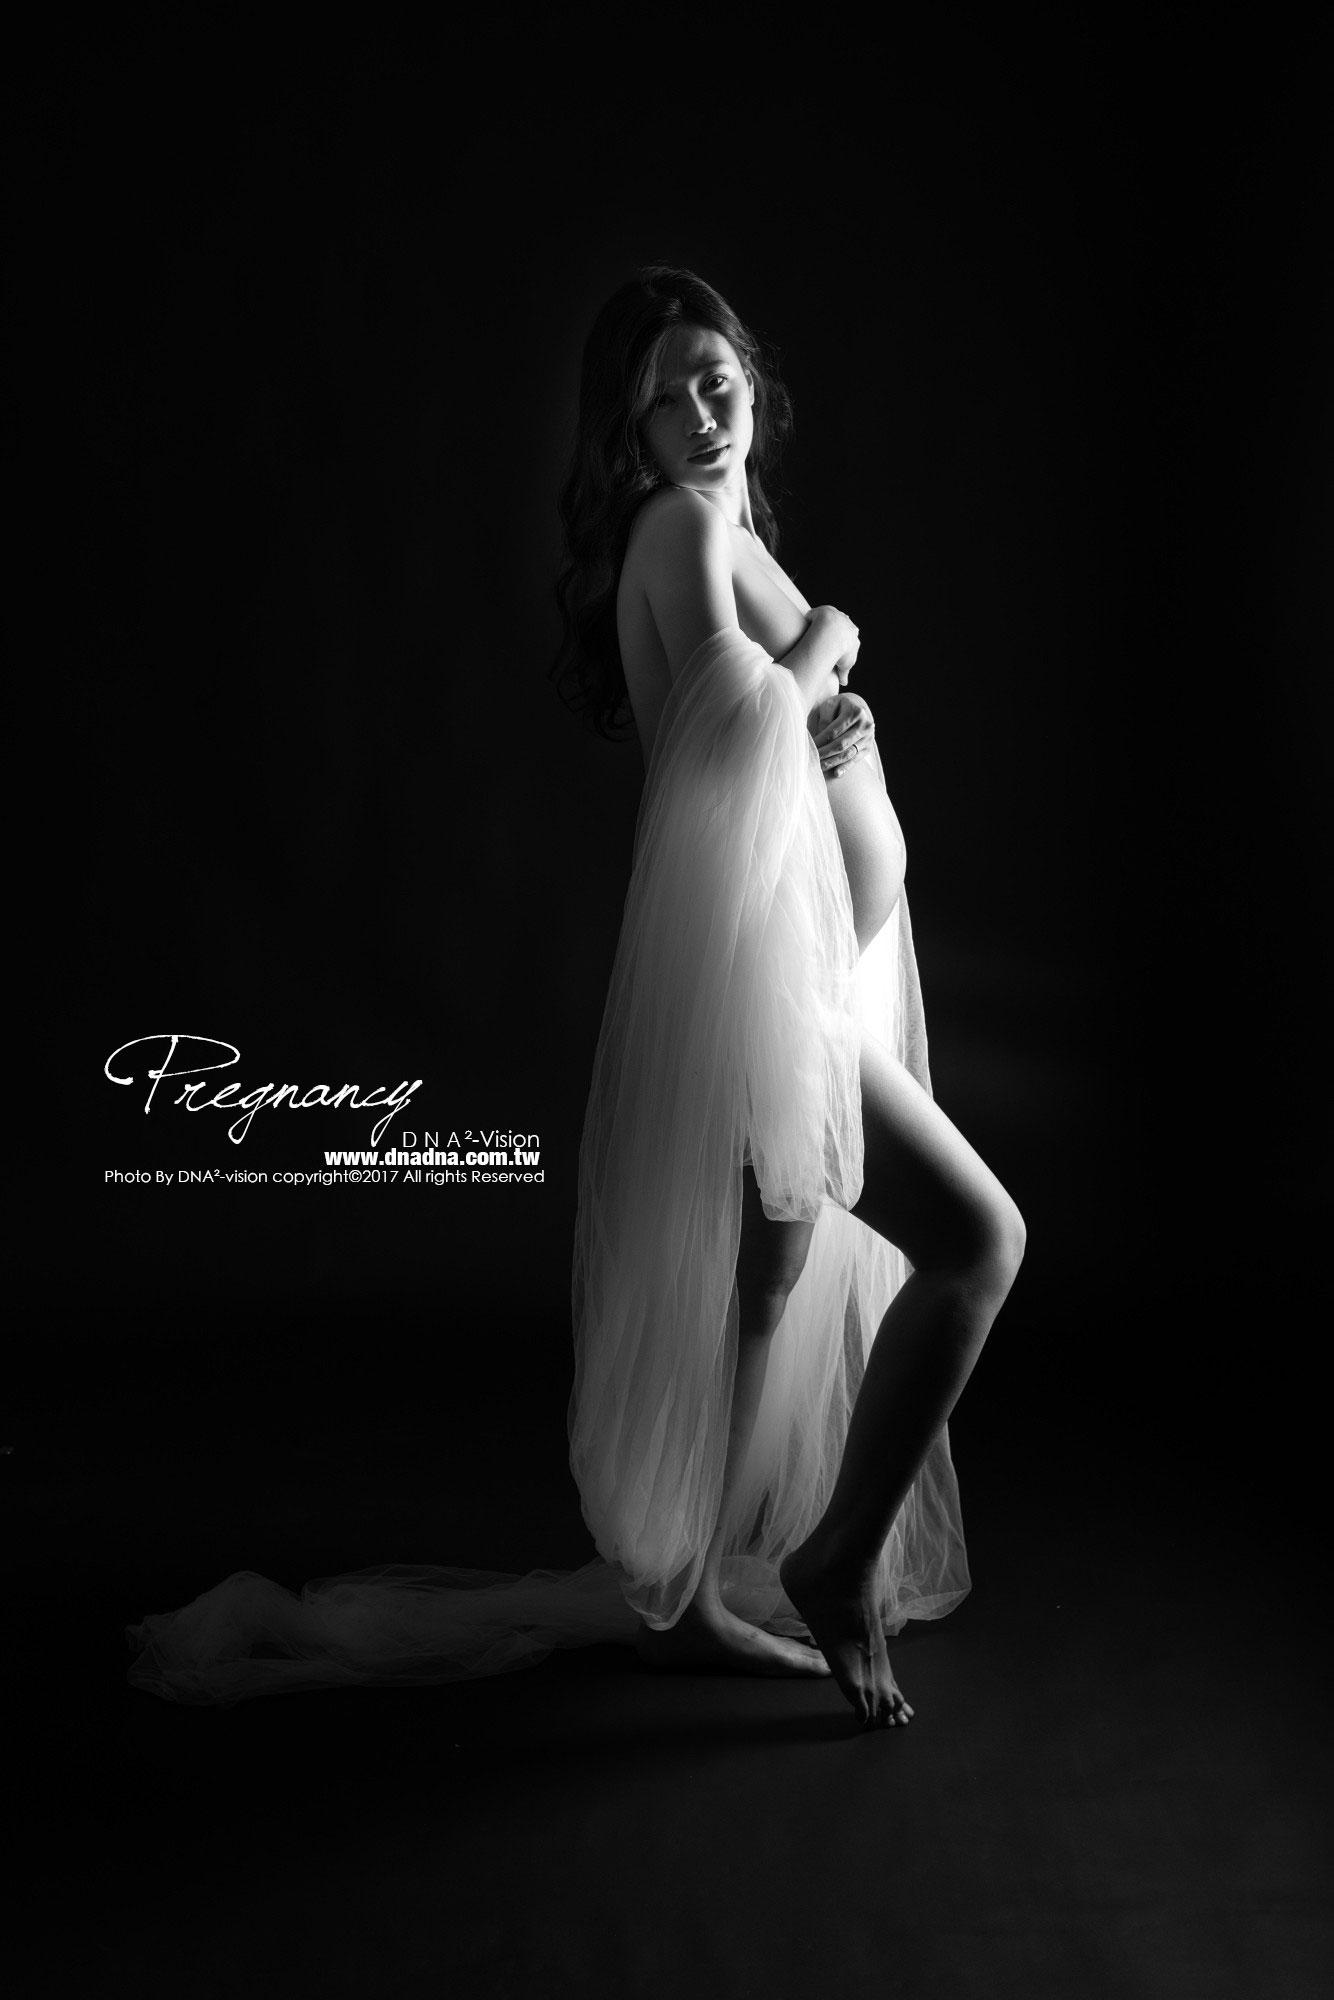 《孕婦寫真》felicia-高雄dna平方dspace攝影棚3